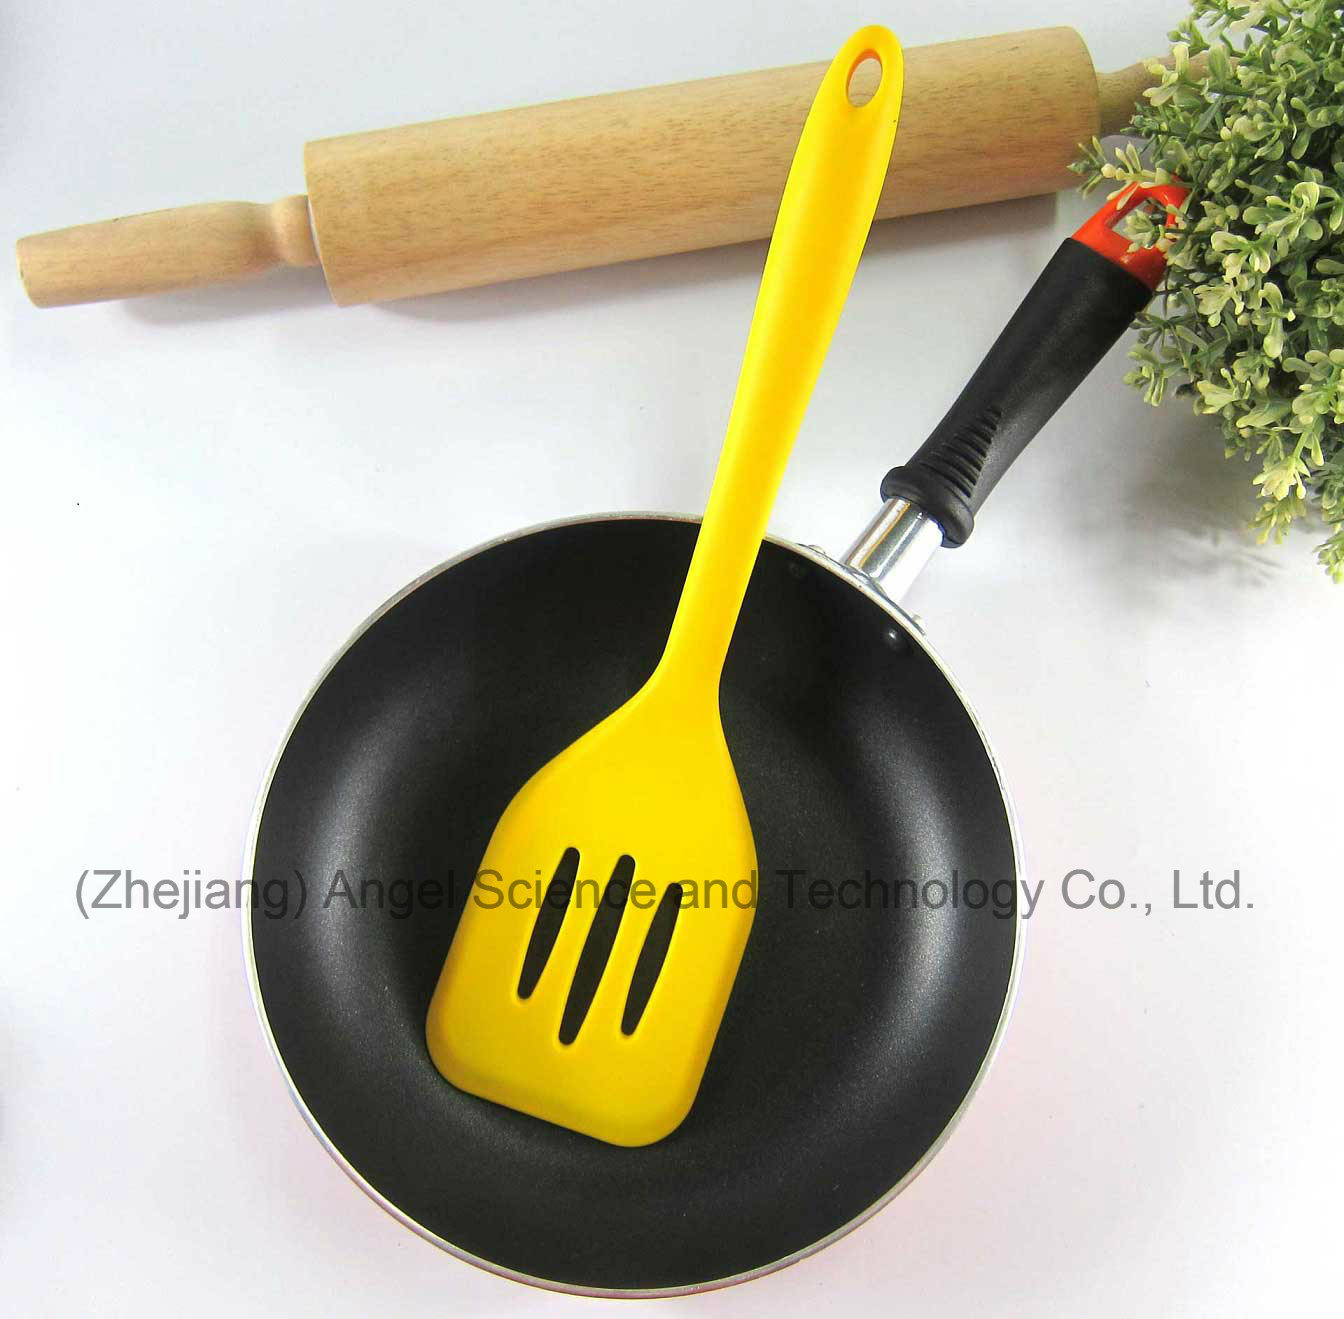 Non-Stick Silicone Cookware Silicone Slotted Spatula for Kitchen Ss11